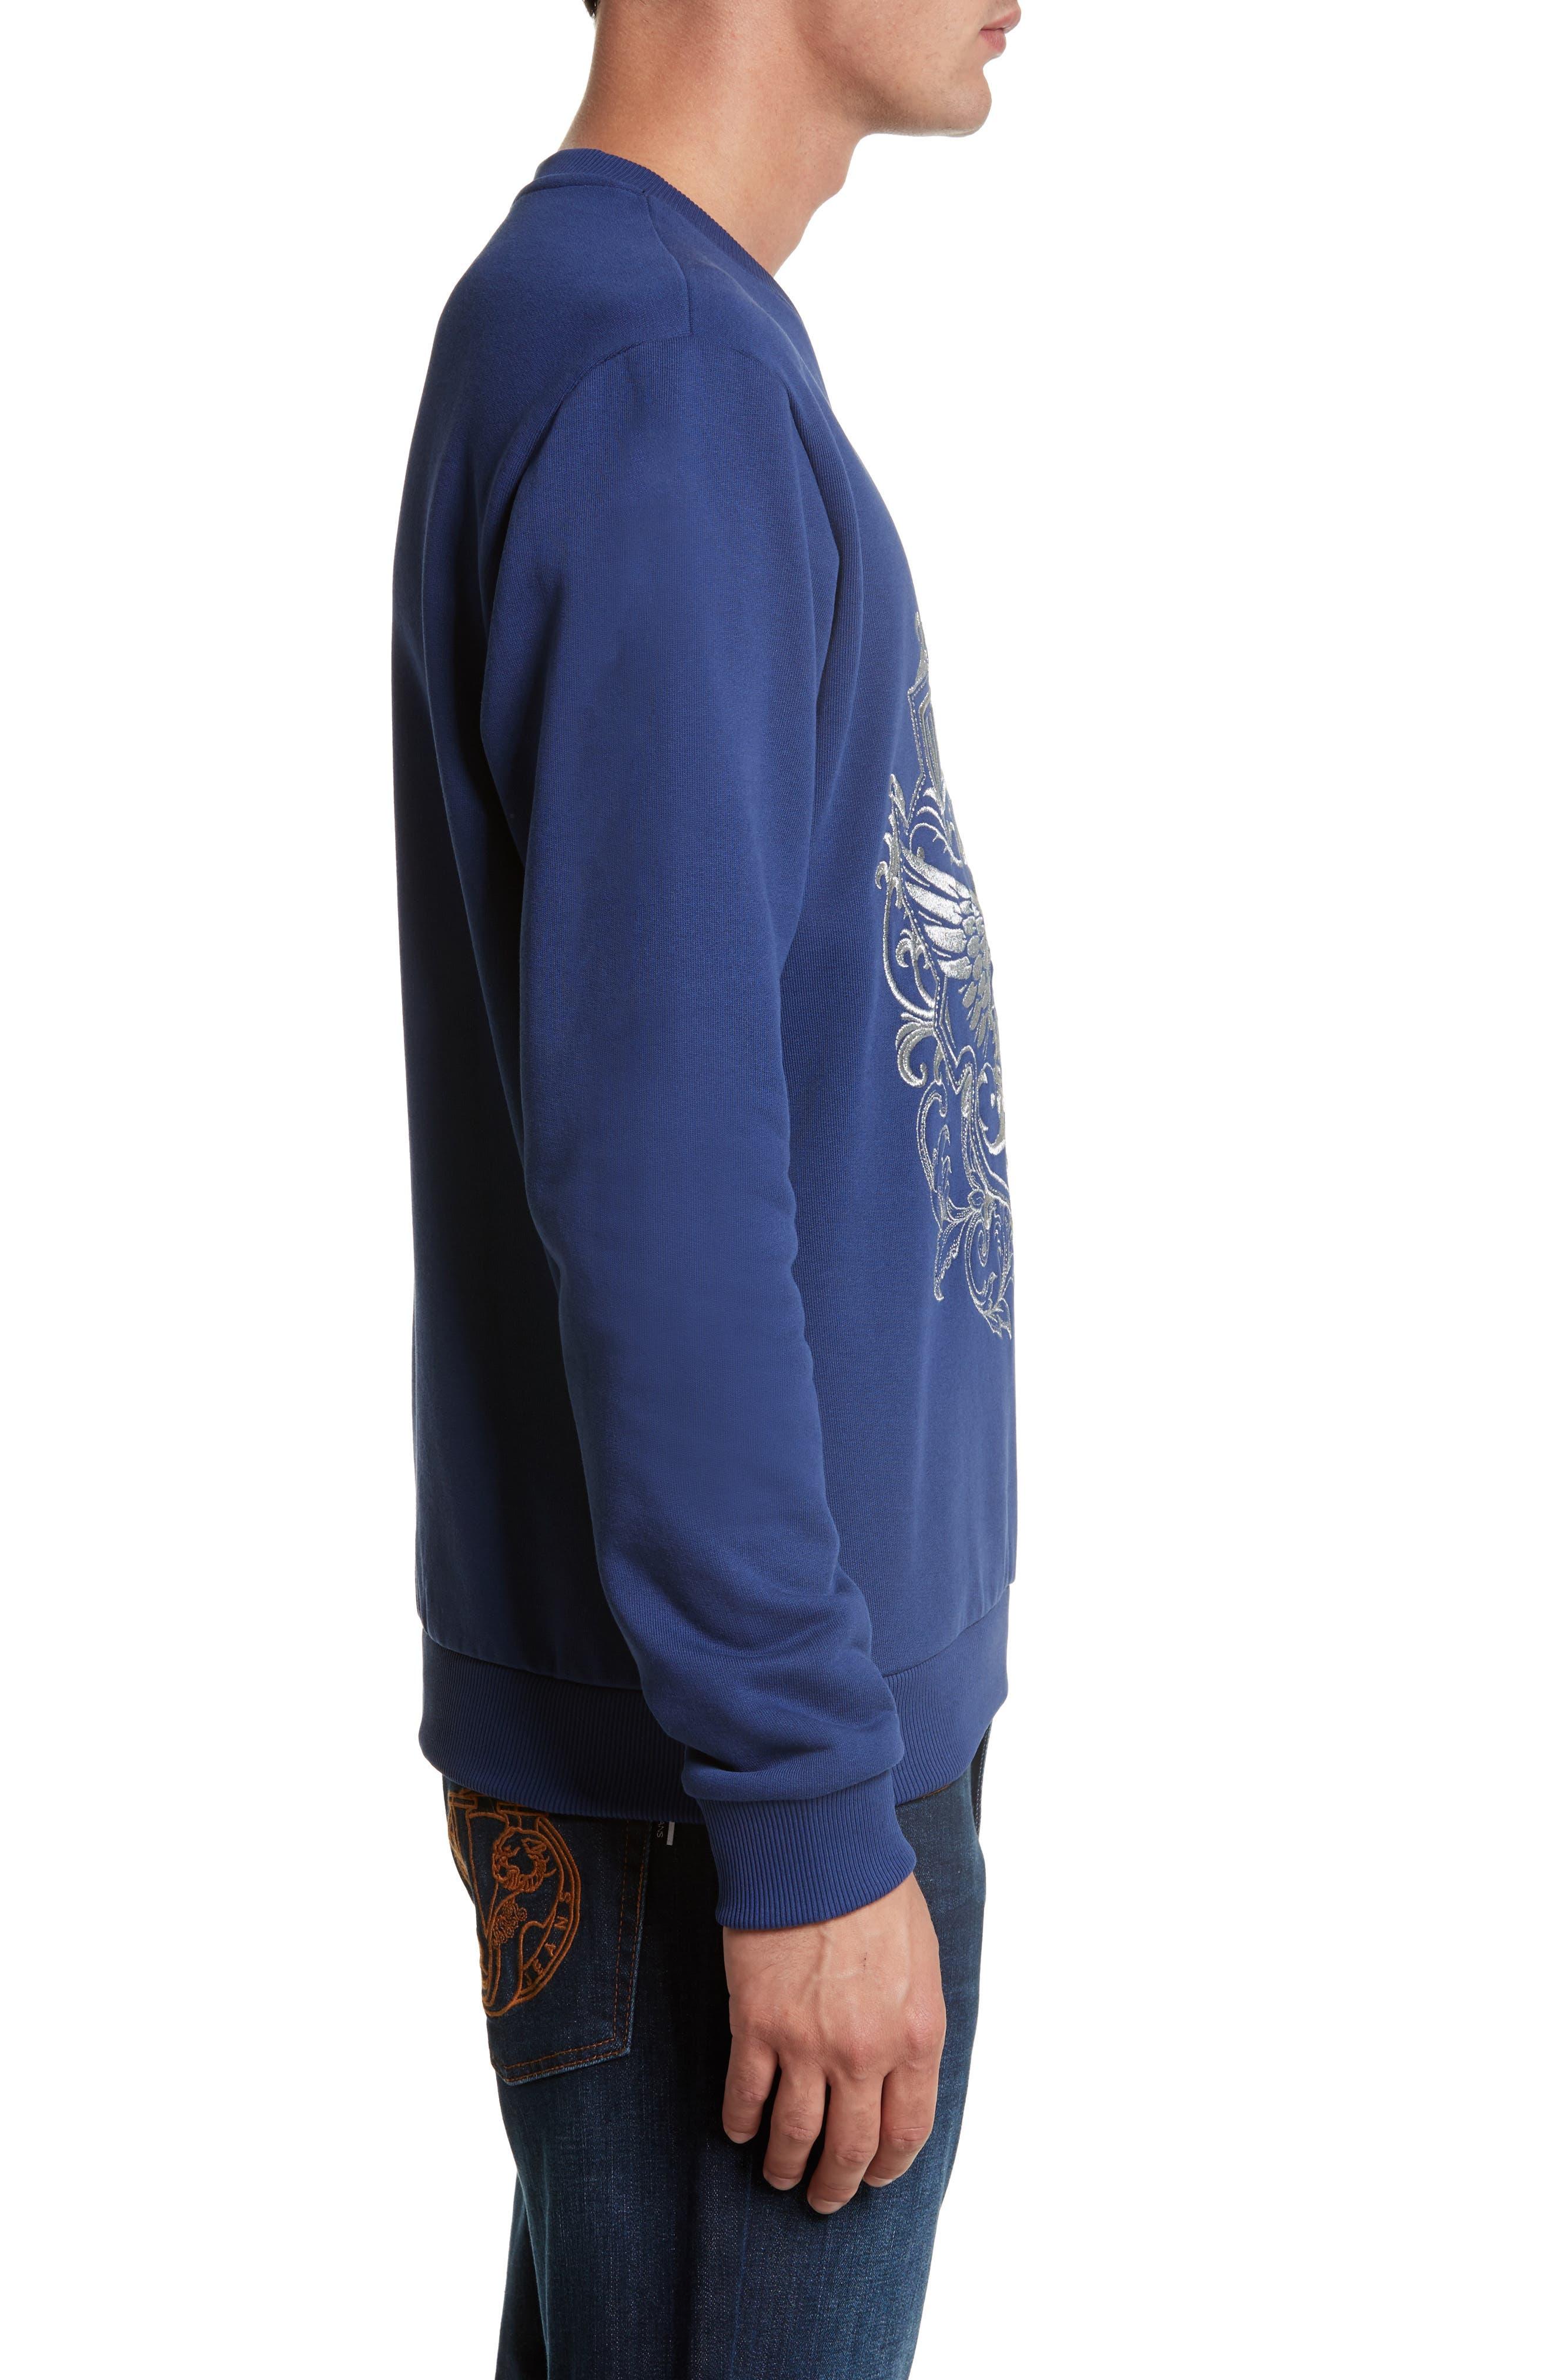 Embroidered Crewneck Sweatshirt,                             Alternate thumbnail 3, color,                             Blue